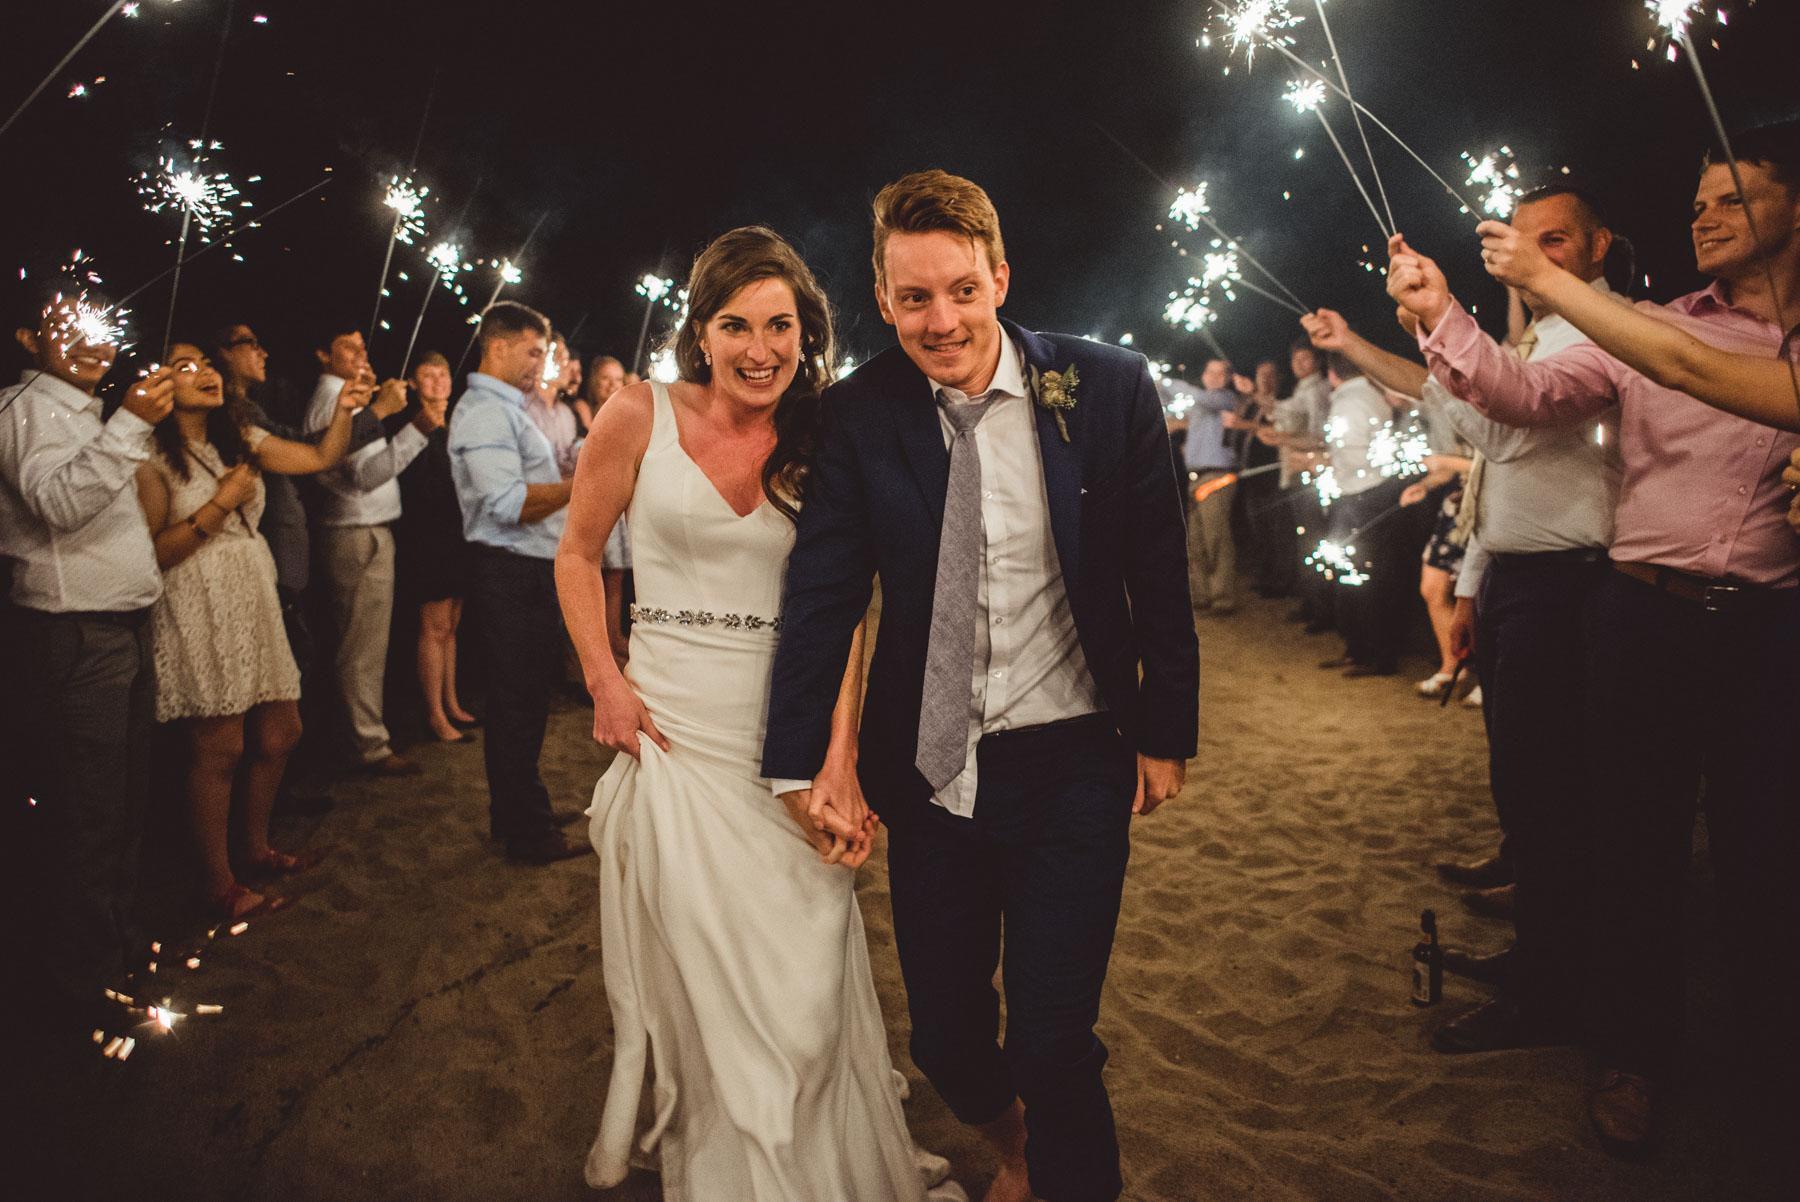 Wedding-Photography-Campground-43.jpg